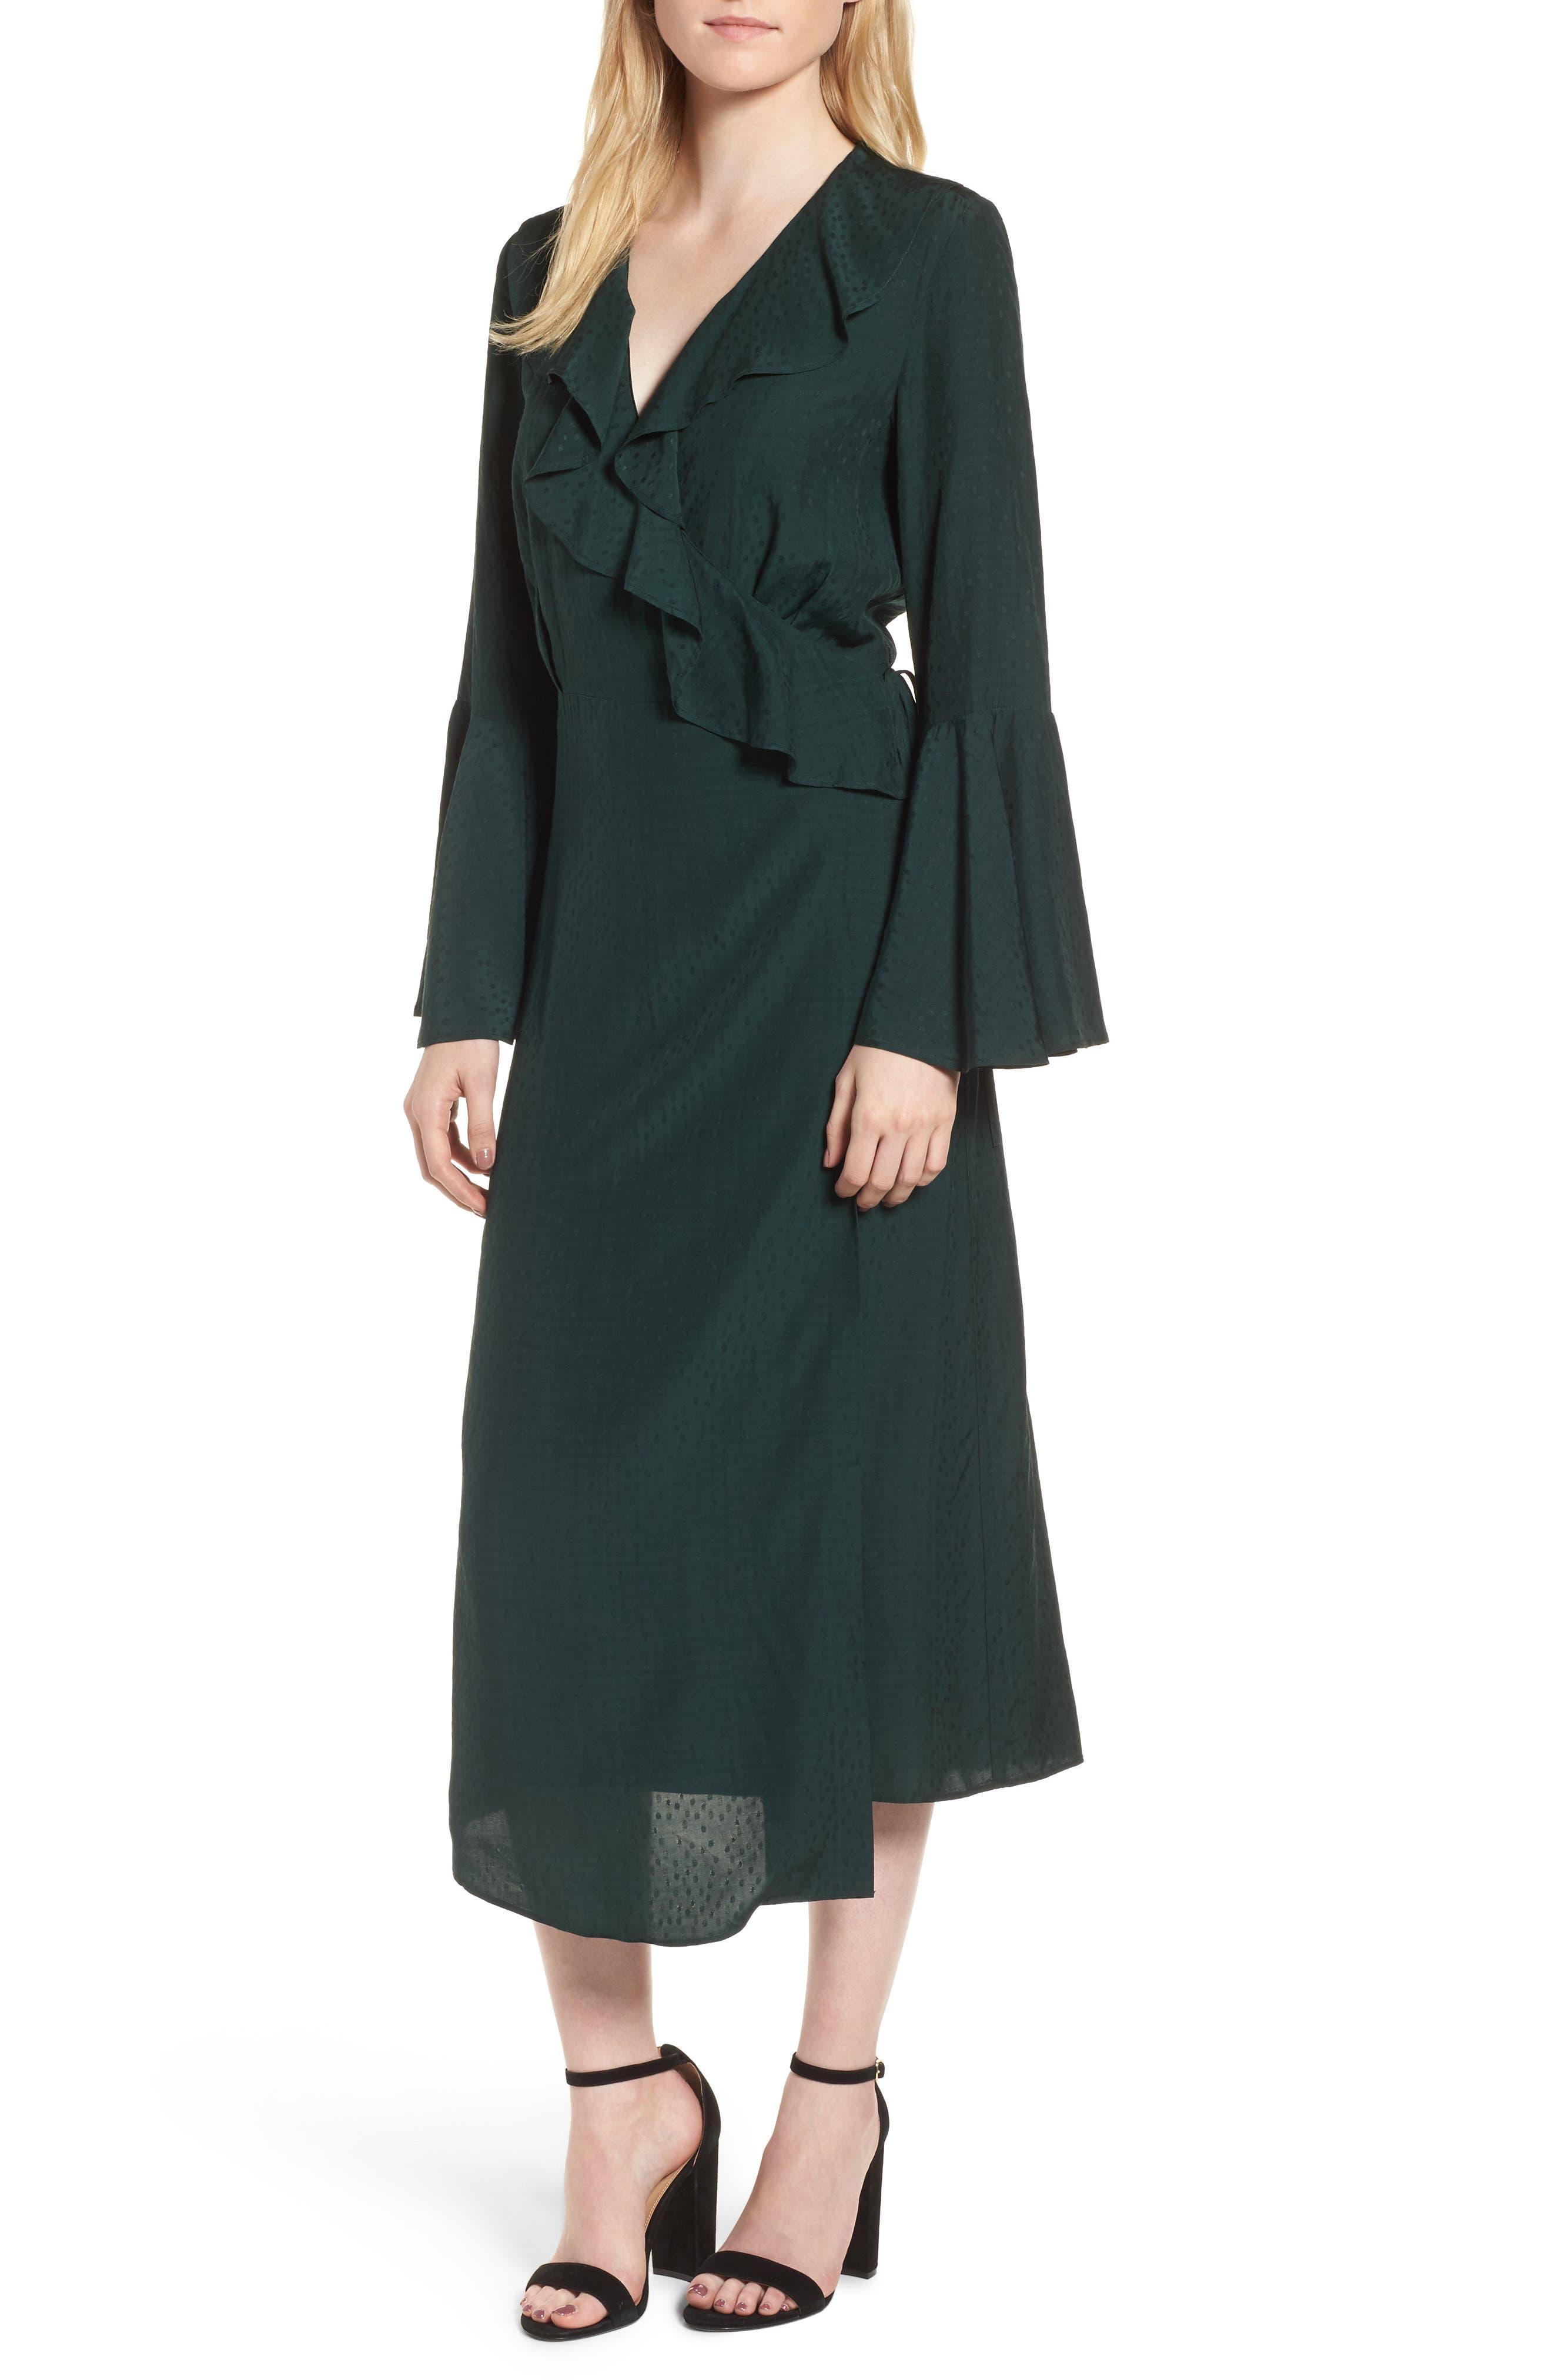 Alternate Image 1 Selected - Chelsea28 Midi Wrap Dress